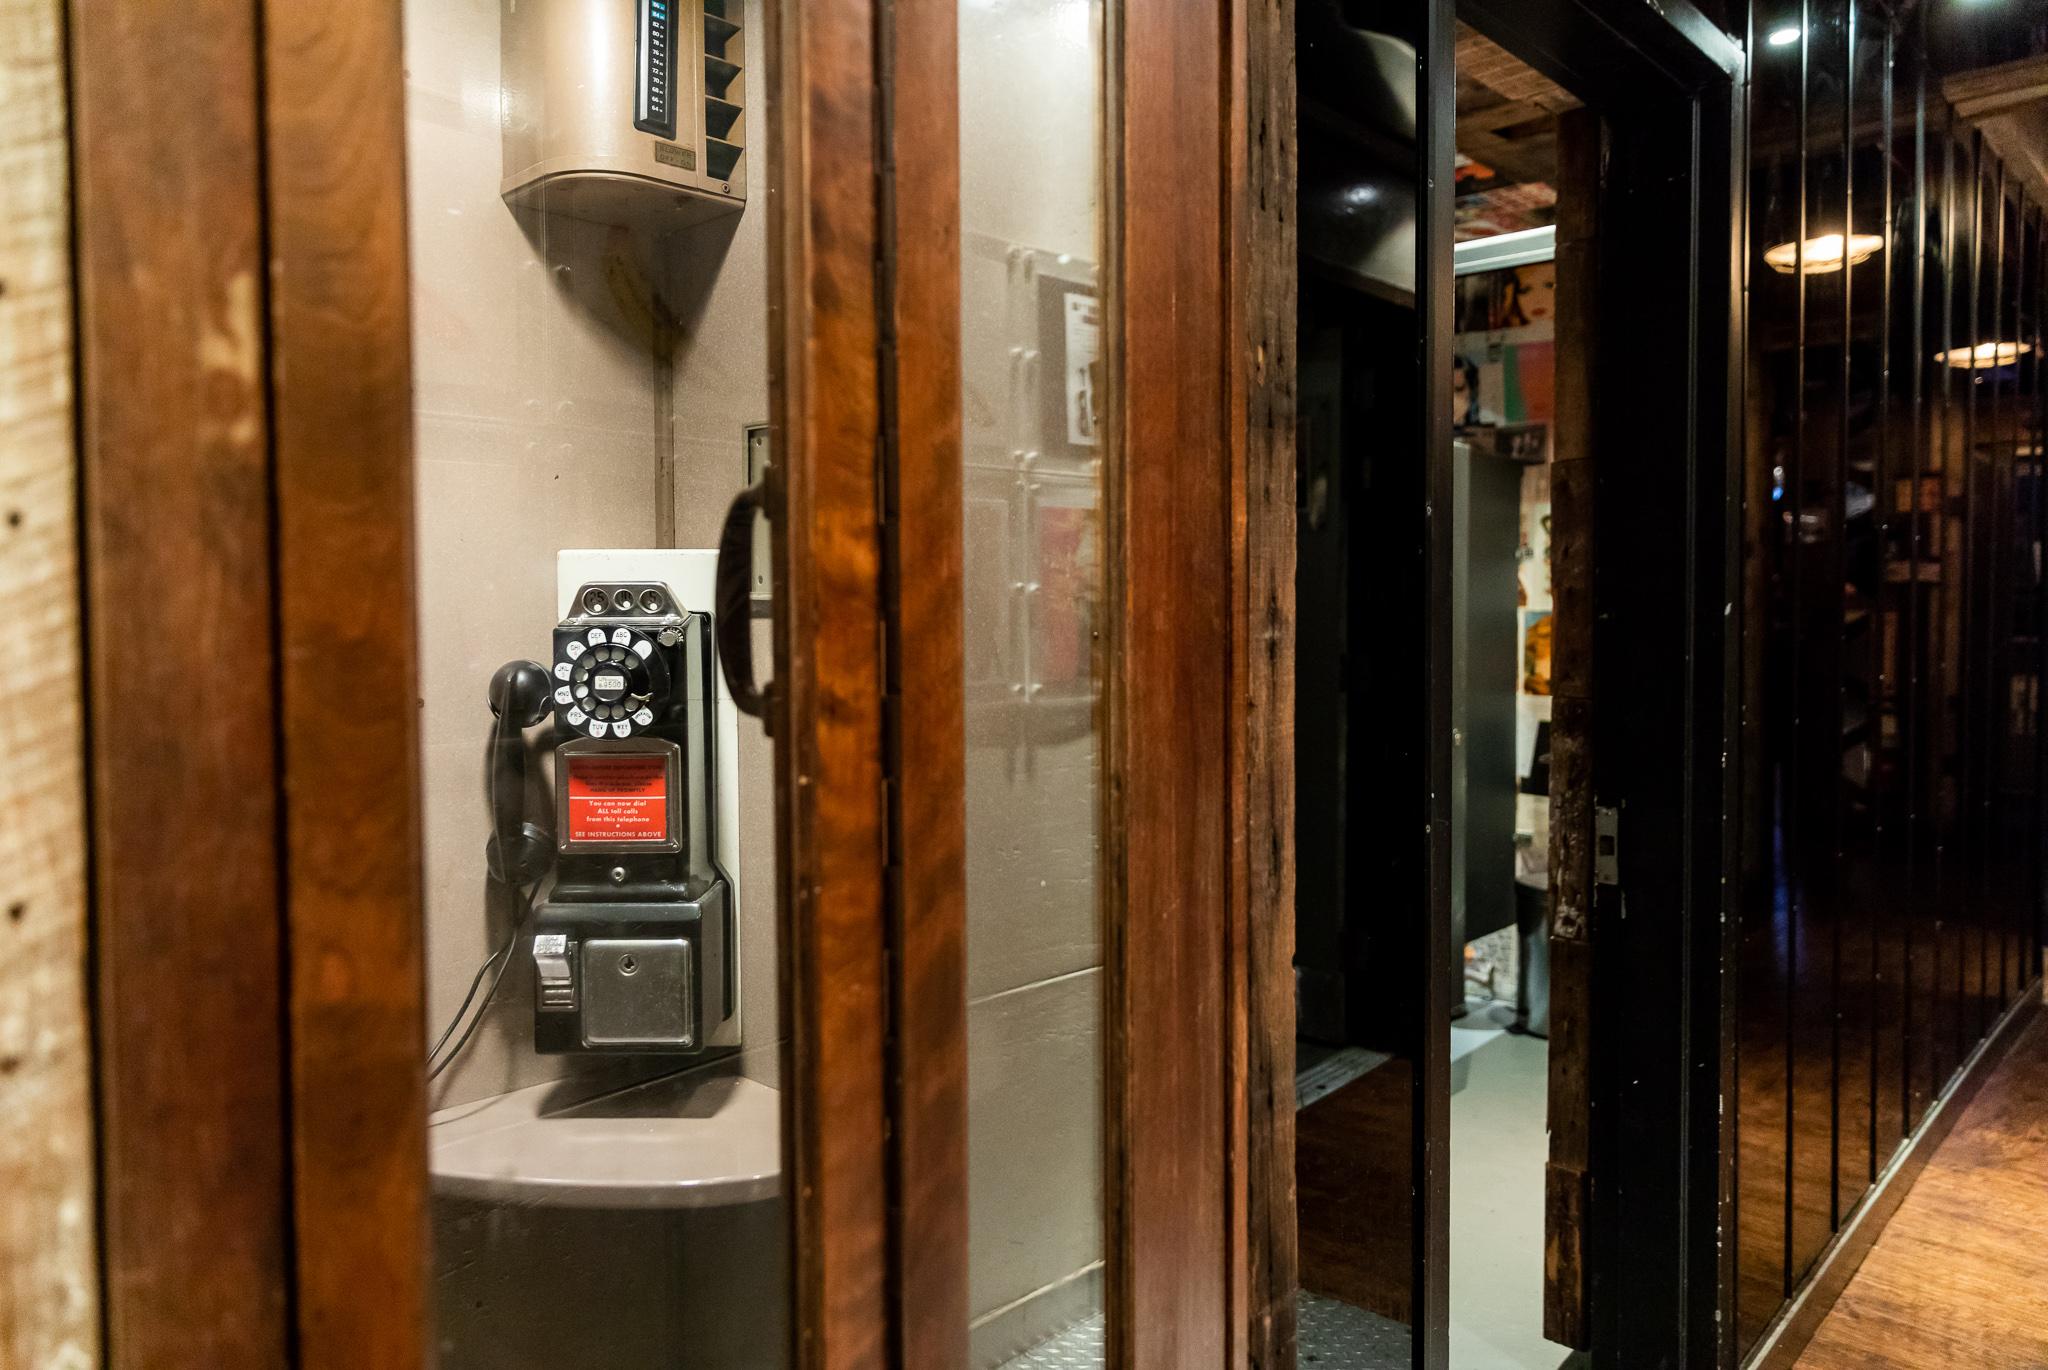 Vintage public telephone